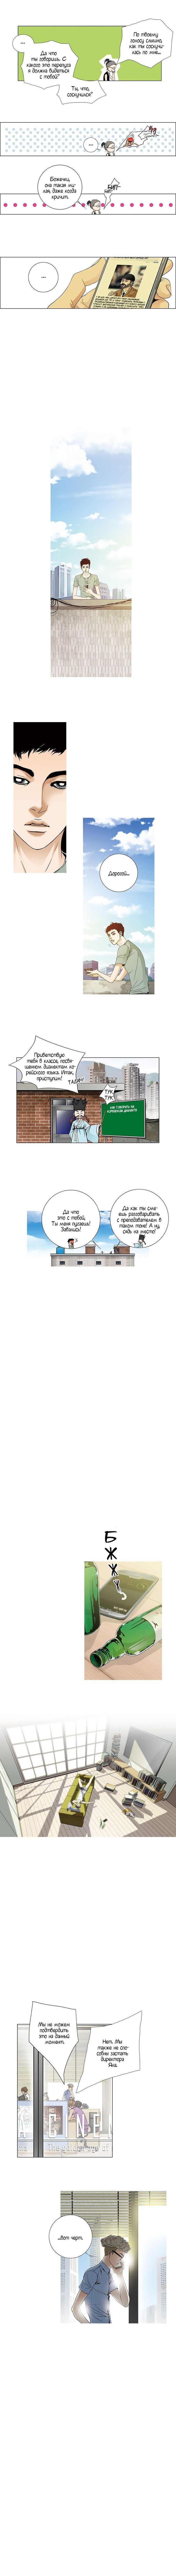 https://r1.ninemanga.com/comics/pic2/29/28573/344330/1512078540885.jpg Page 3